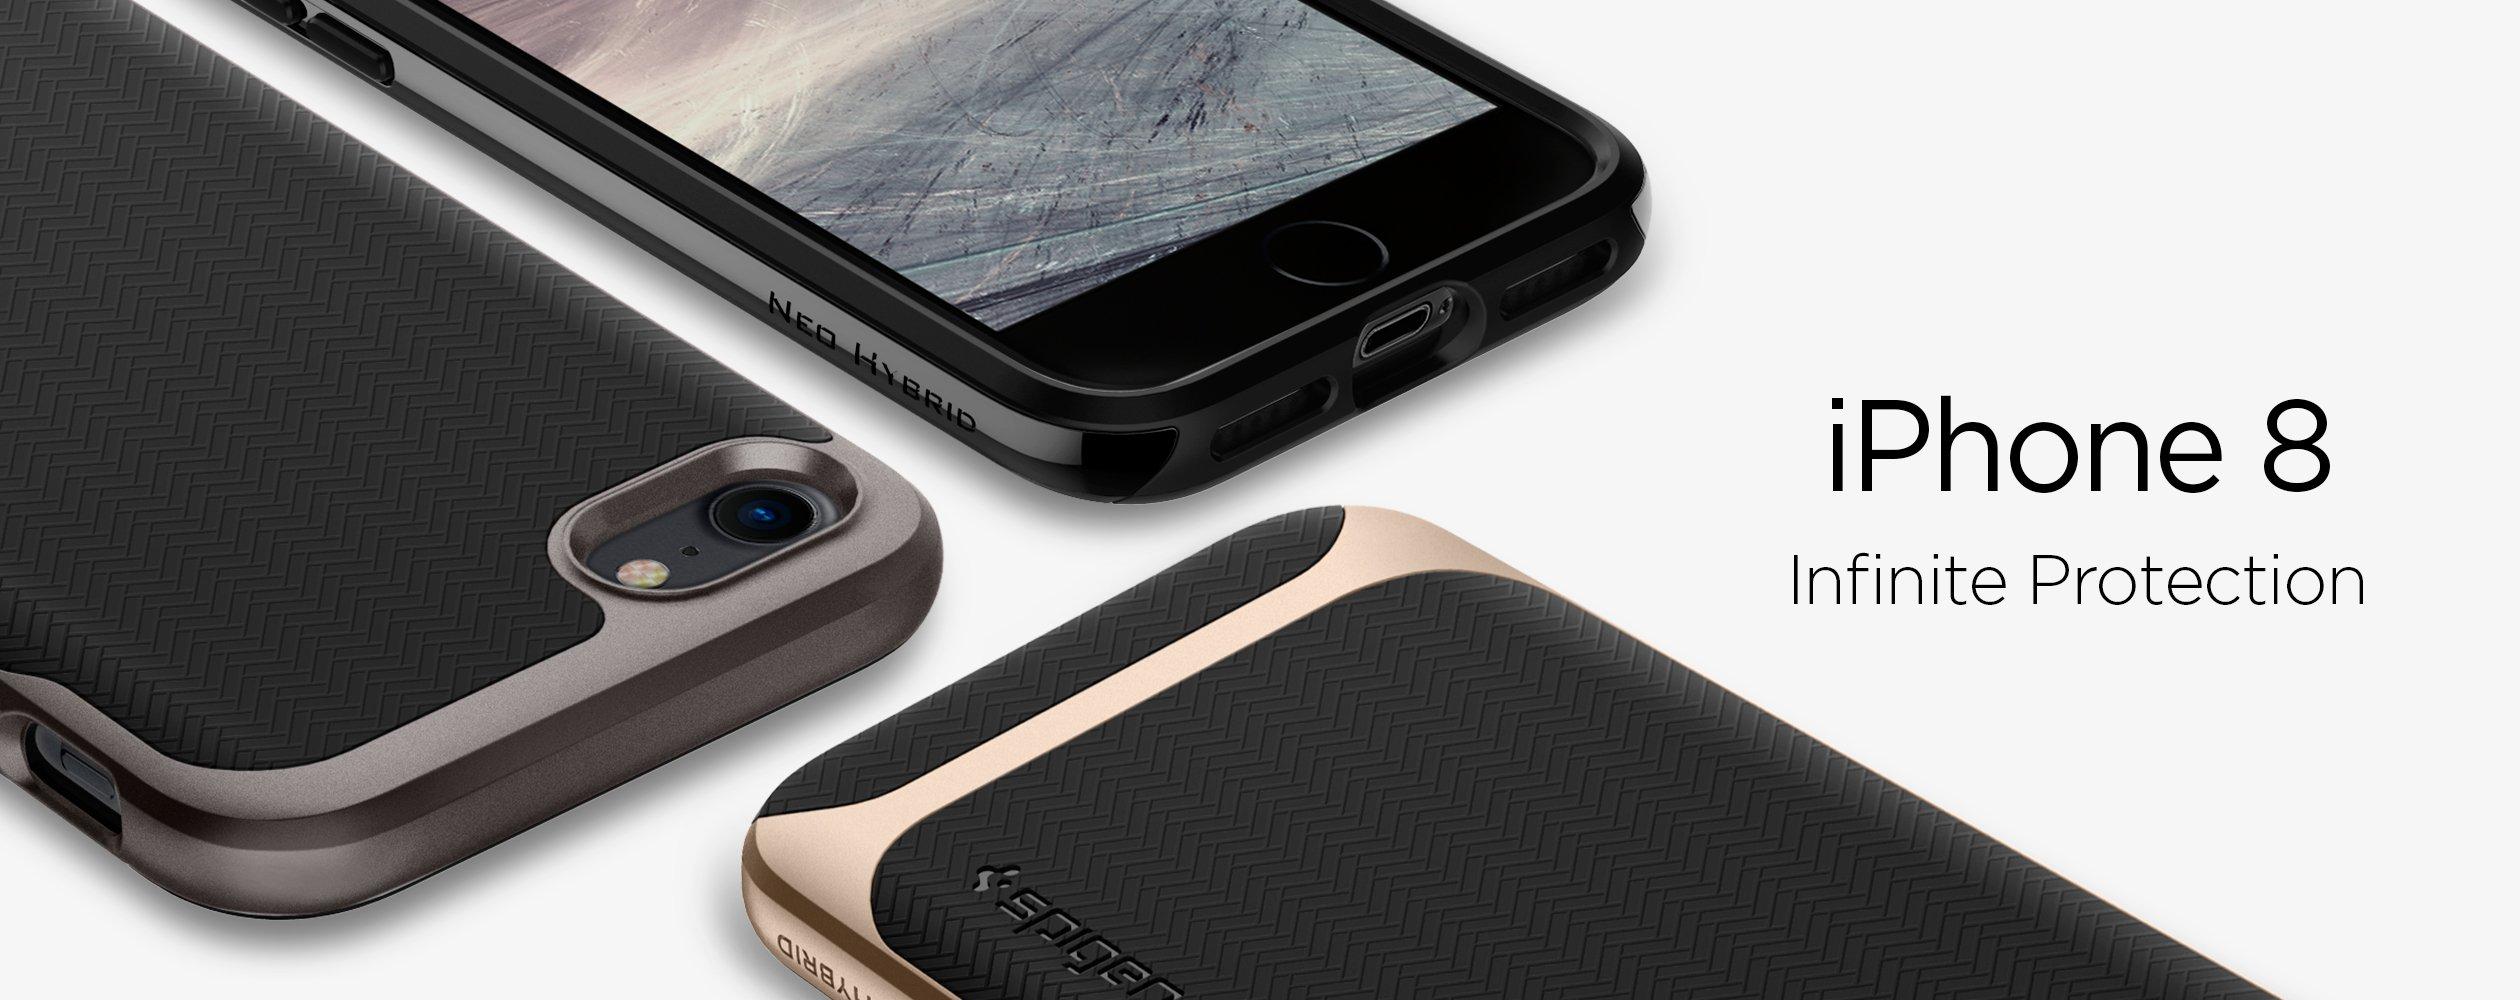 Apple Iphone 8 7 Case Spigen Australia Military Armor Samsung Galaxy S7 Flat Crystal Shell Original 1 2